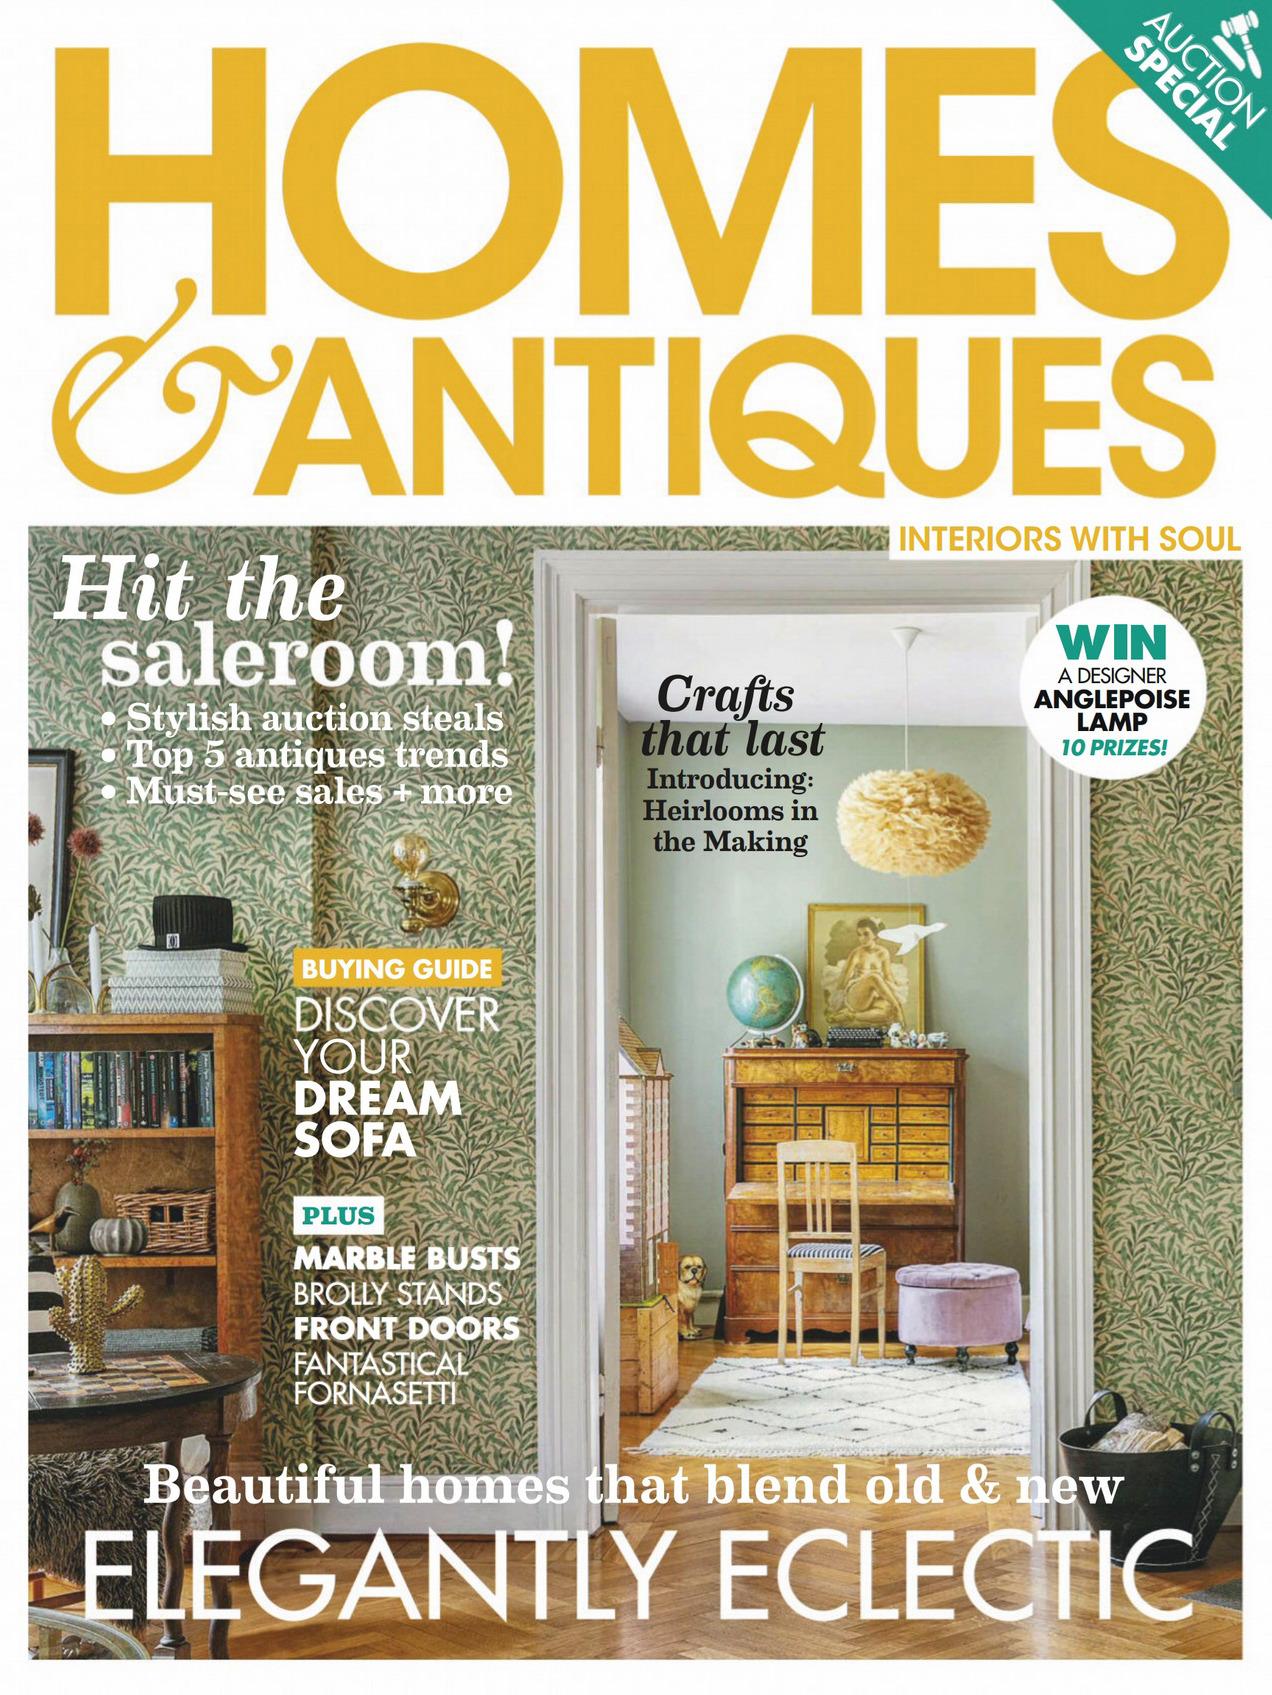 《Homes & Antiques》英国版时尚家居杂志2020年04月号